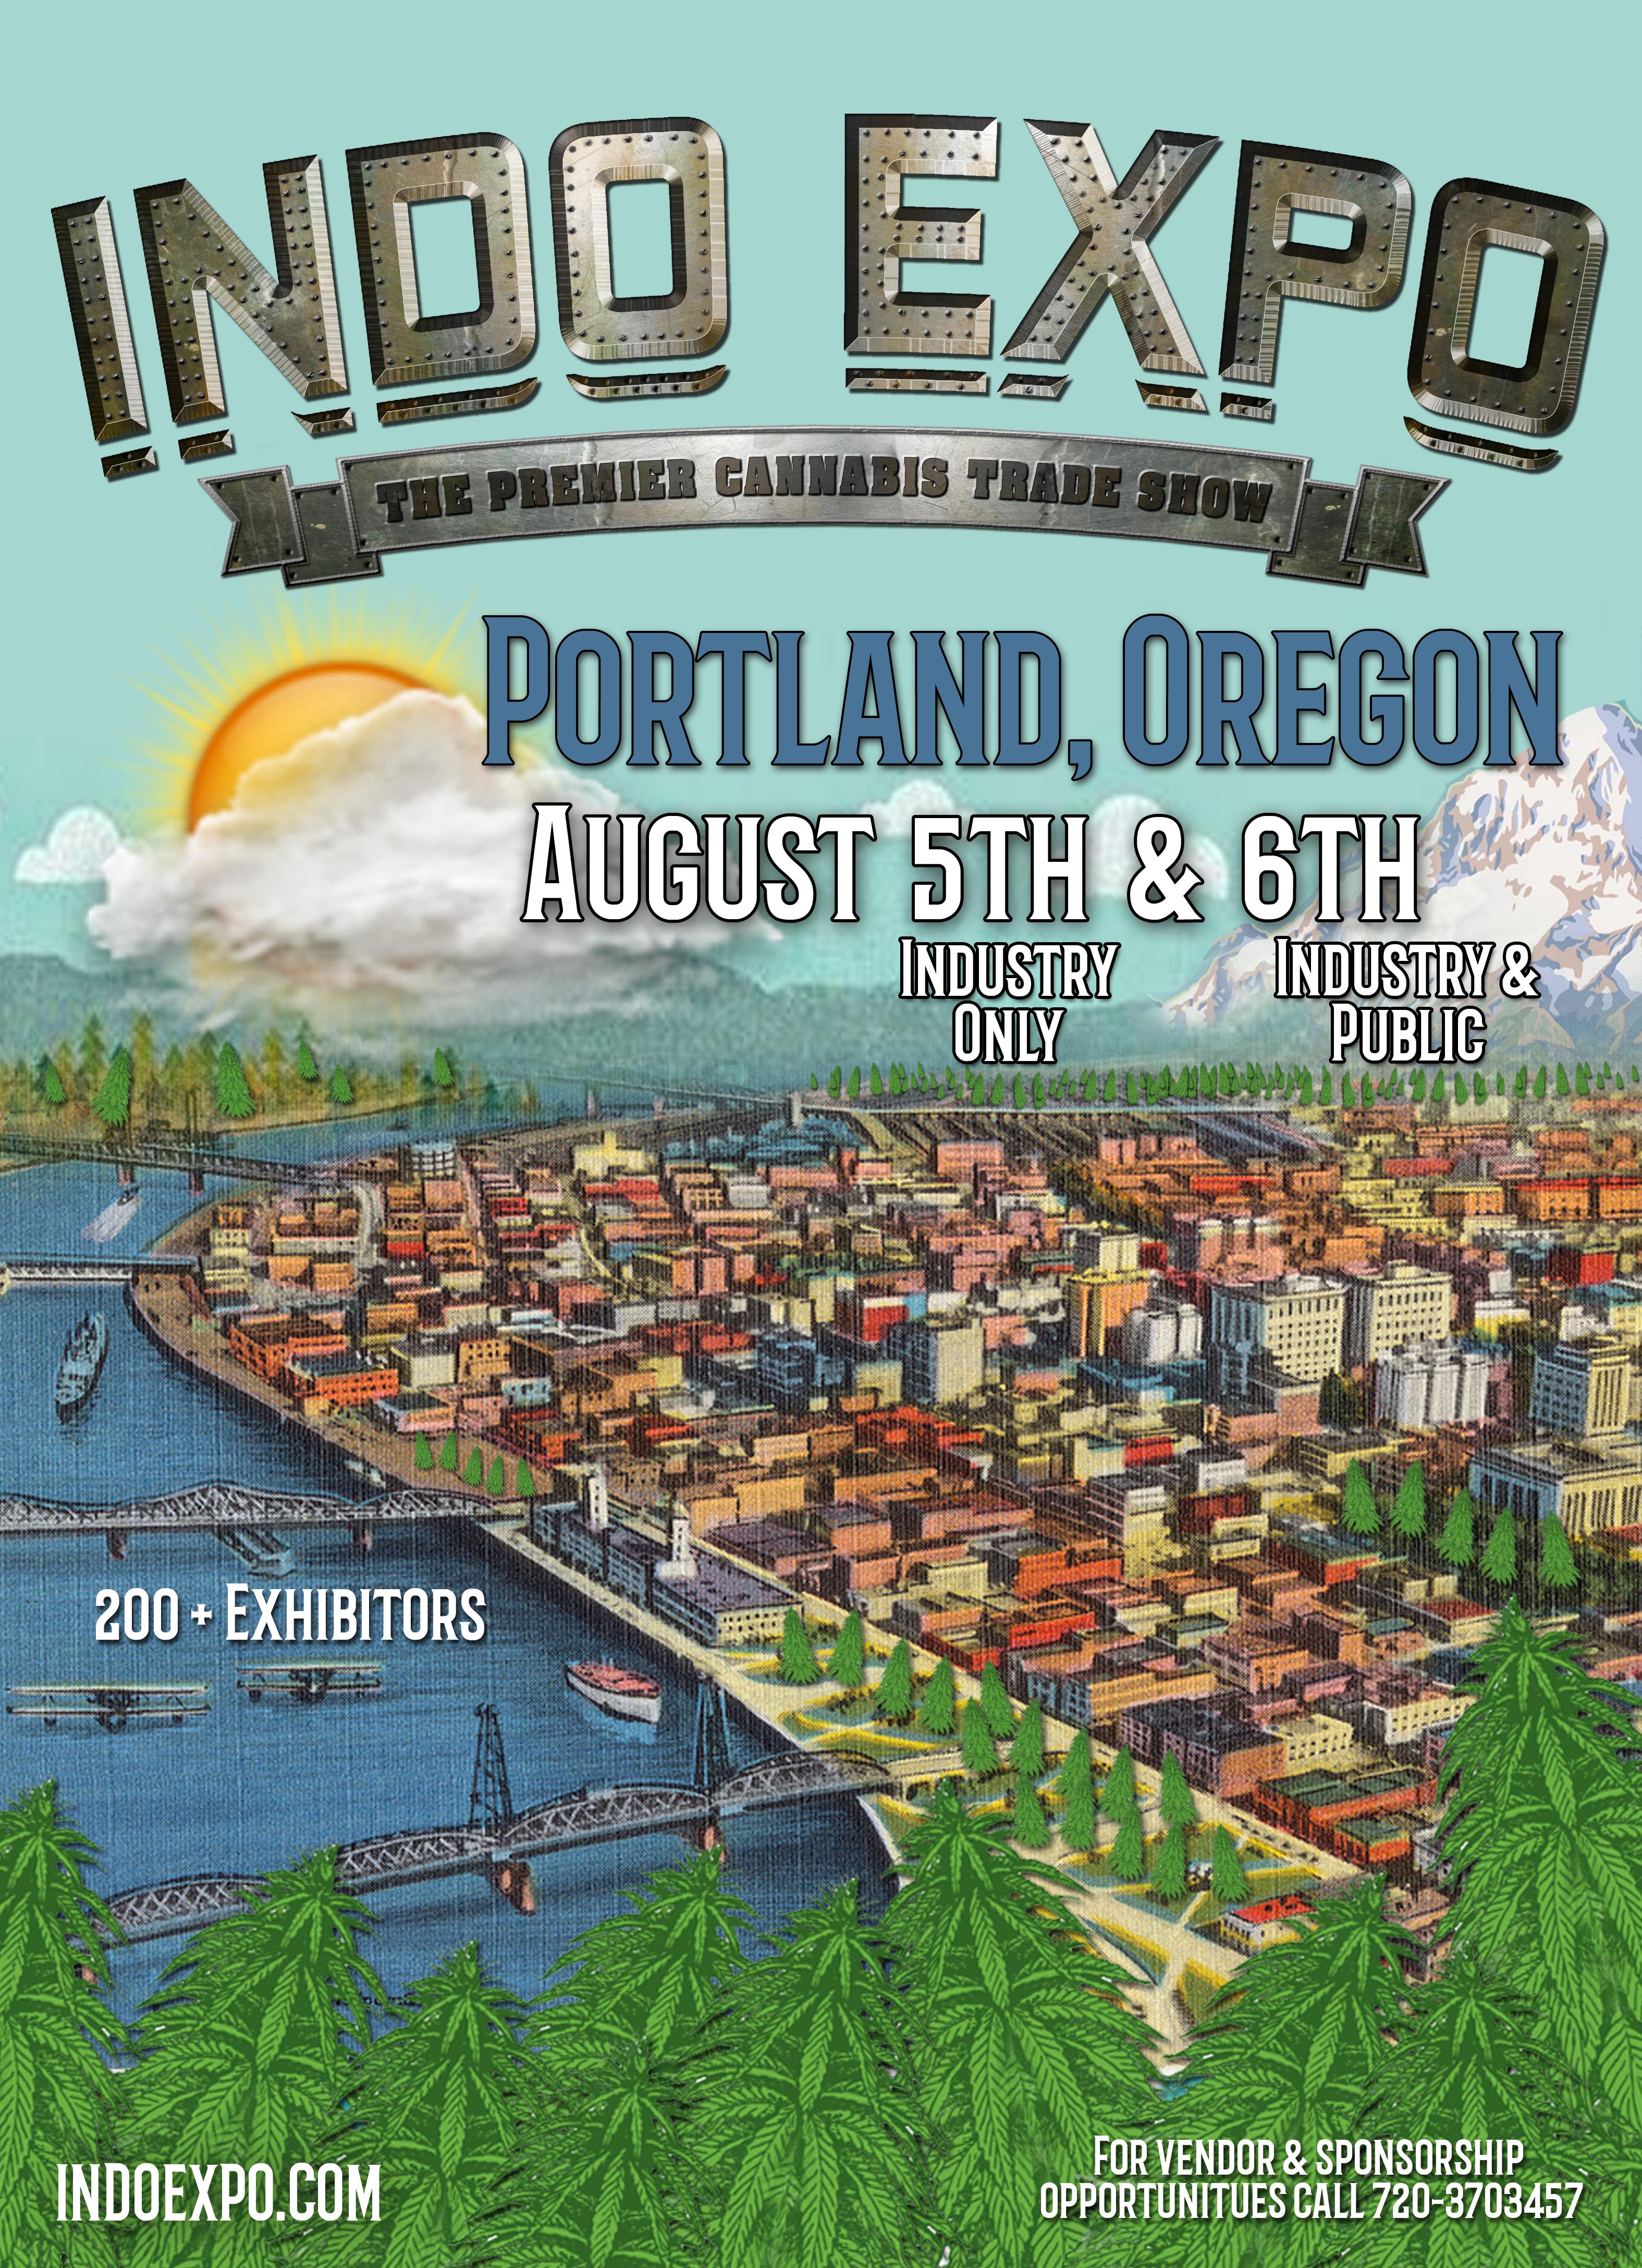 Indo Expo: The premier Cannabis Tradeshow